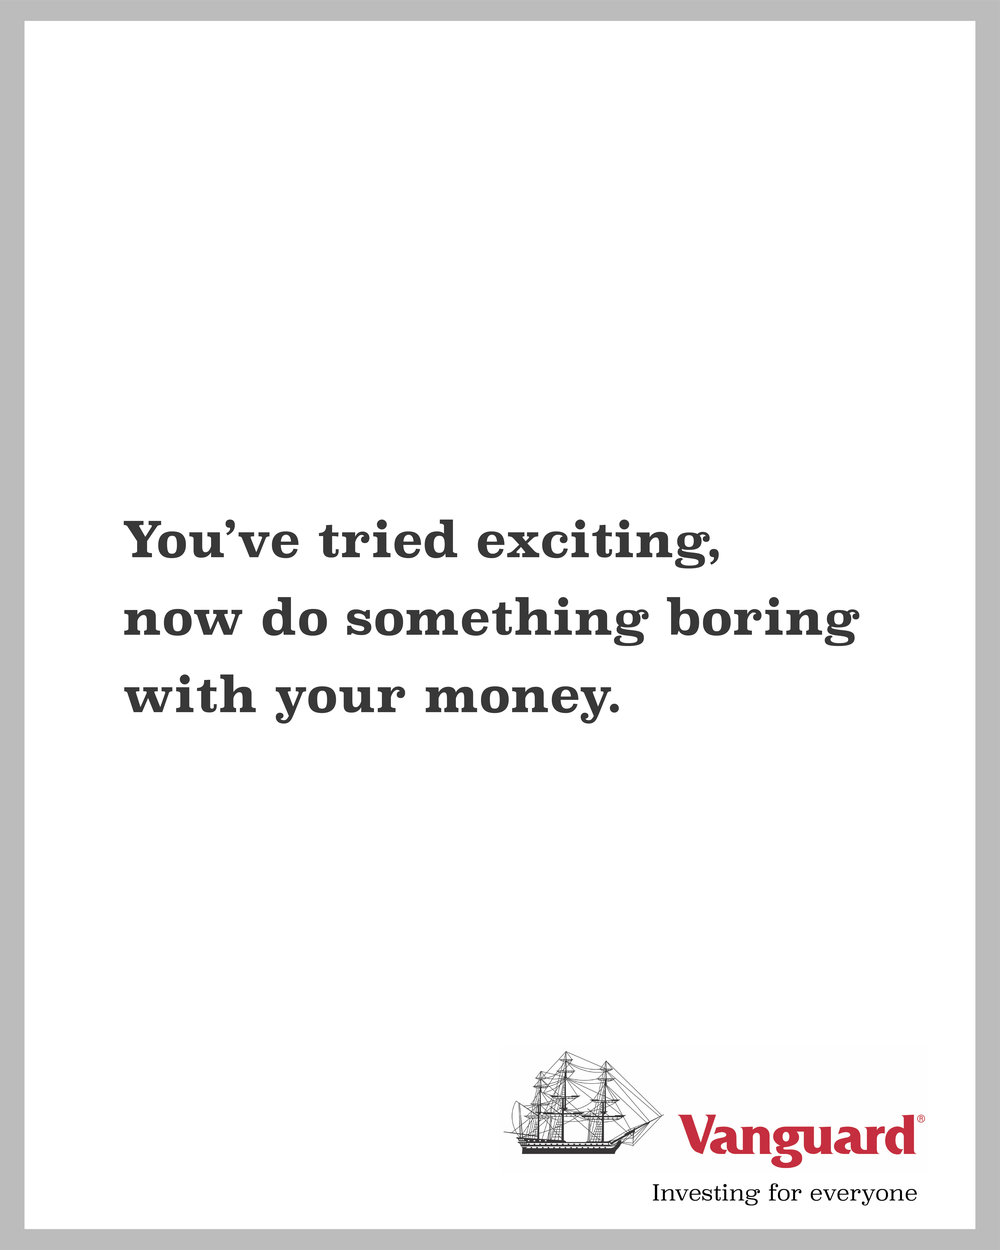 Print ads-13.jpg